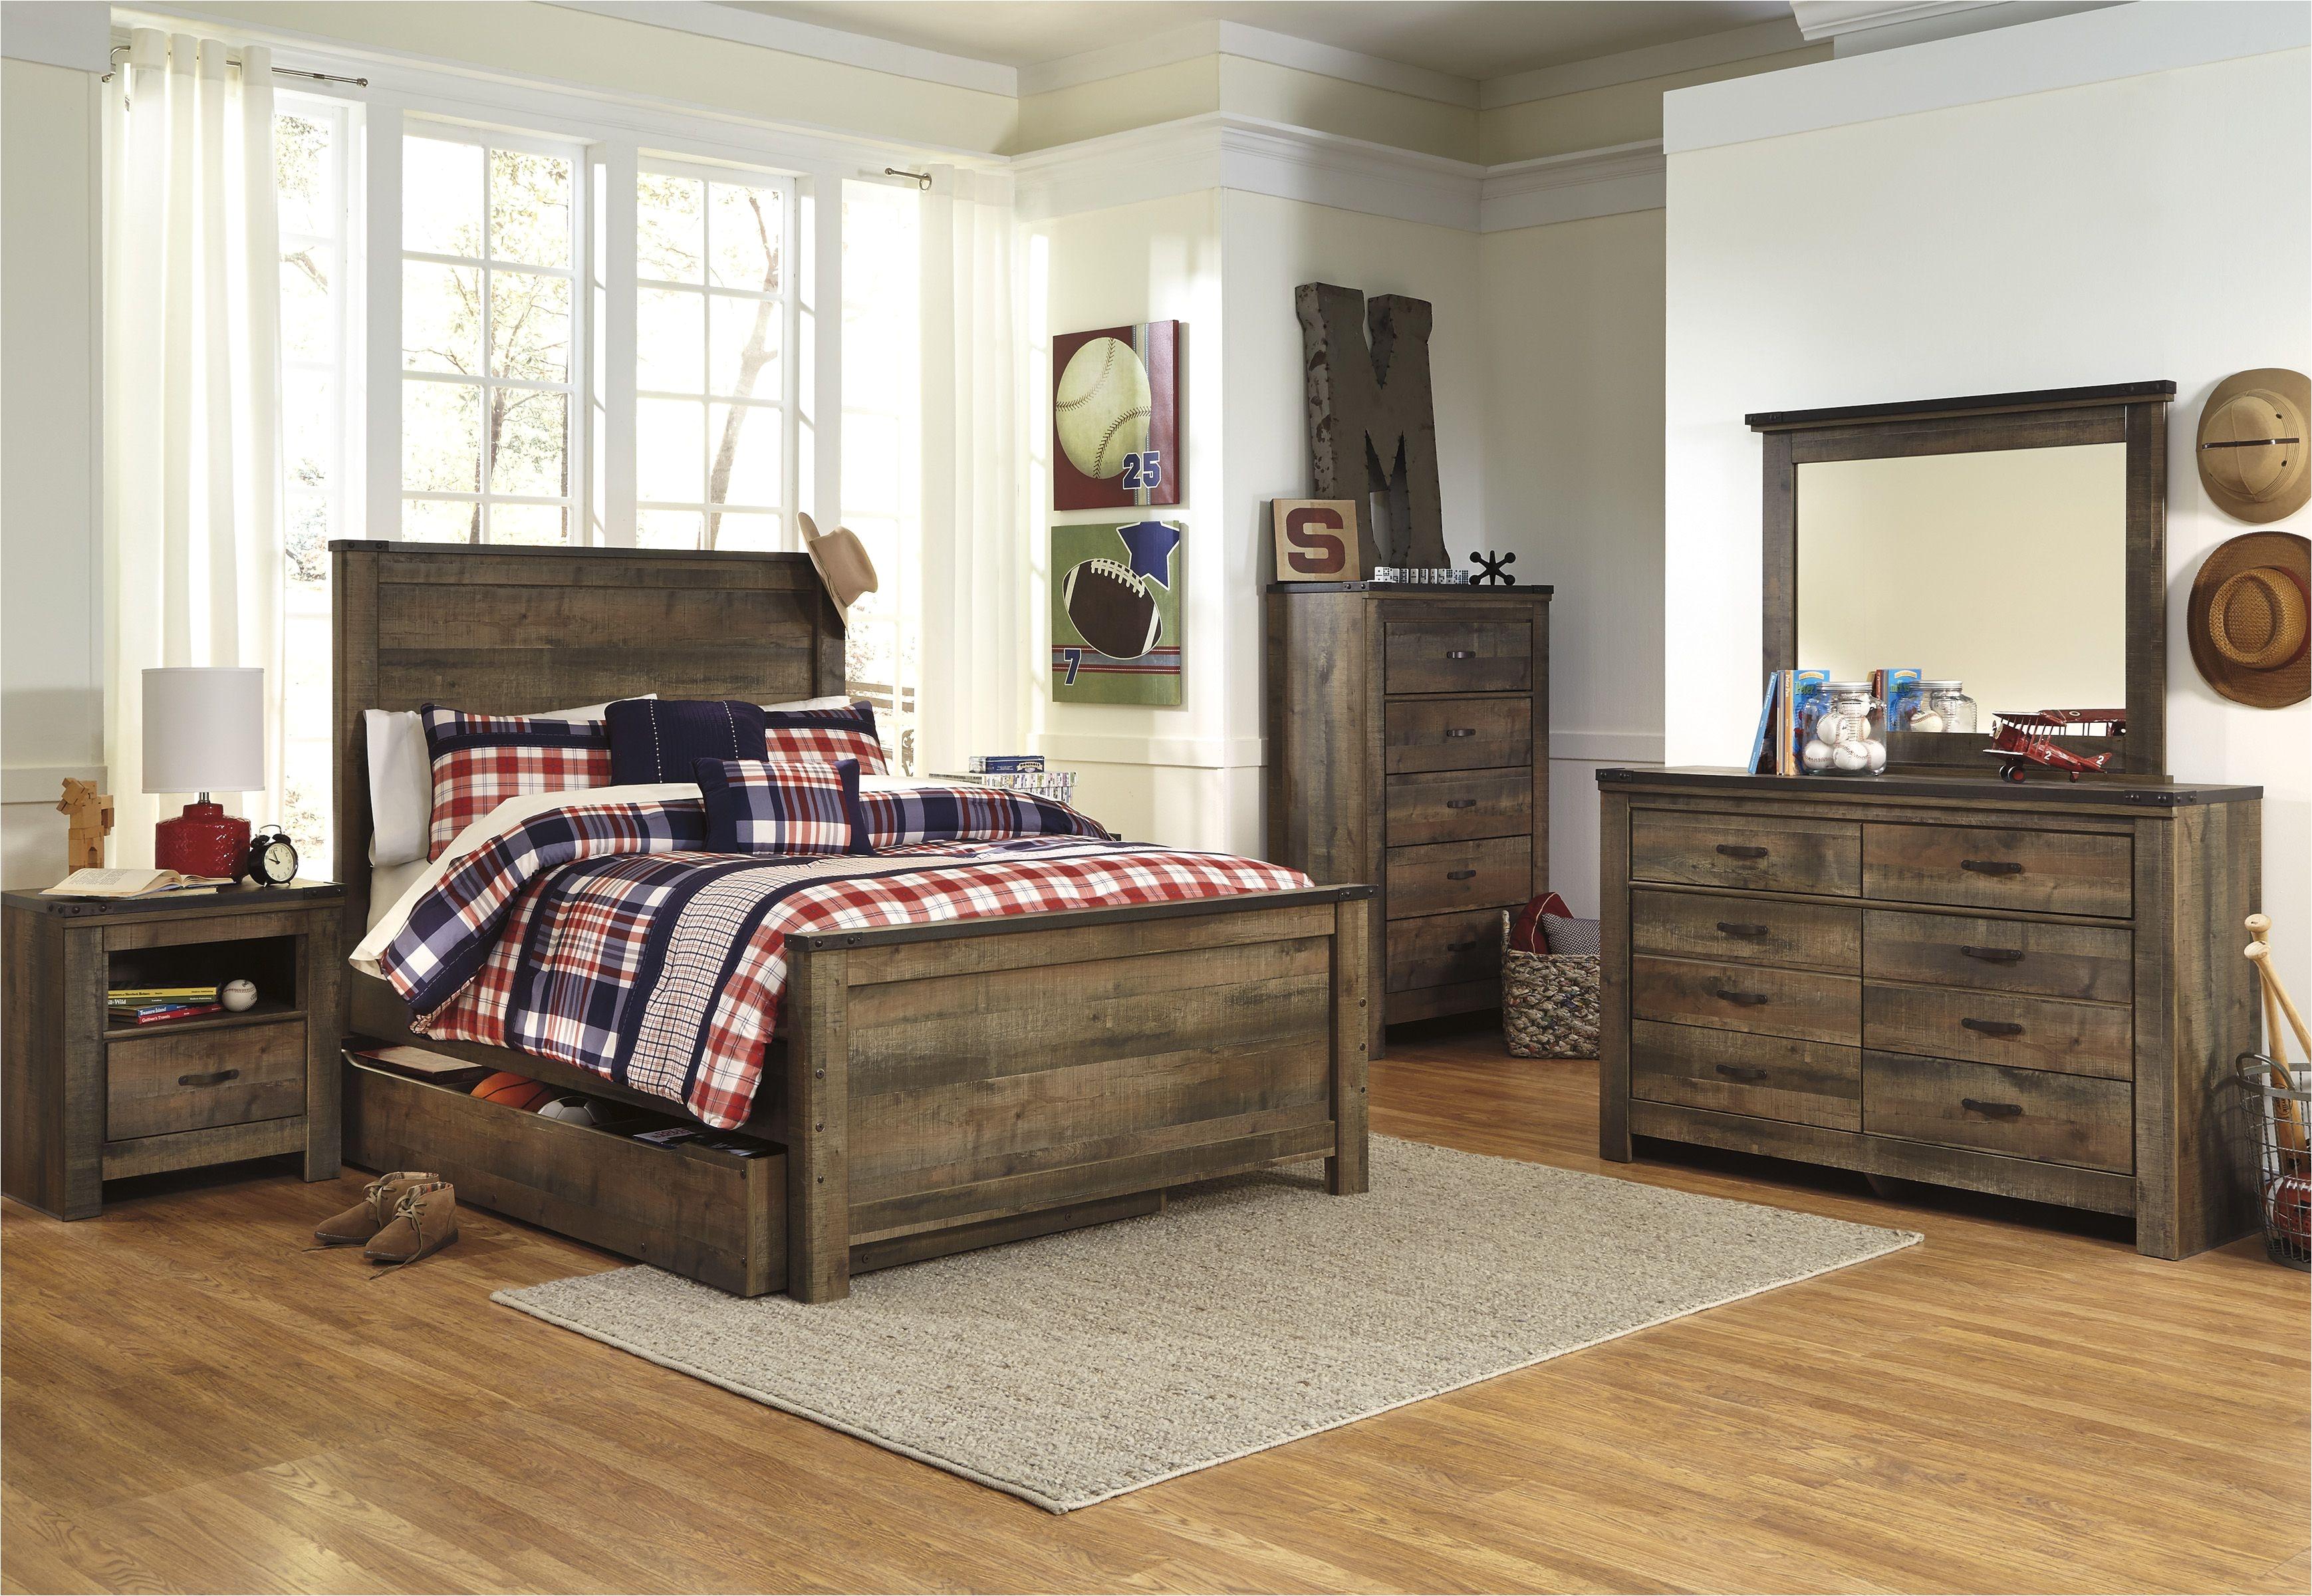 signature designs bedroom ikidz full bed walker furniture las vegas nevada